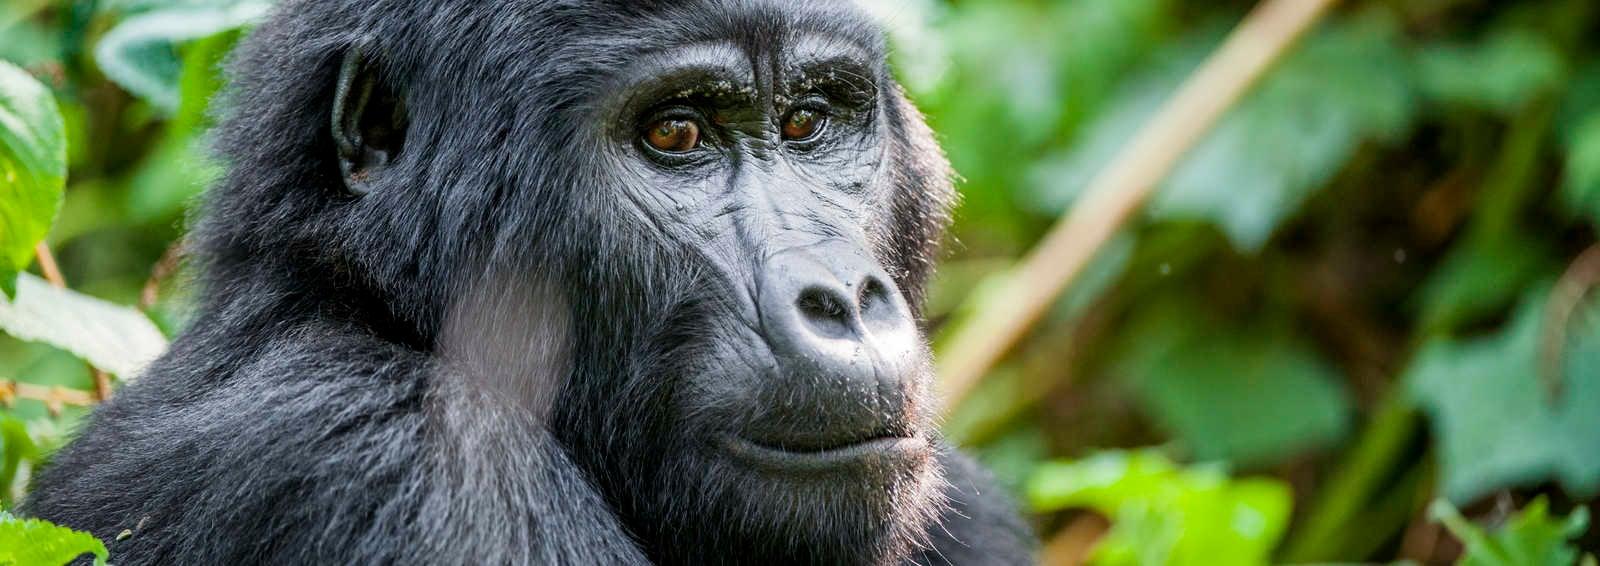 Close up portrait of a mountain gorilla (beringei beringei) at a short distance in natural habitat. Bwindi Impenetrable Forest National Park, Uganda.